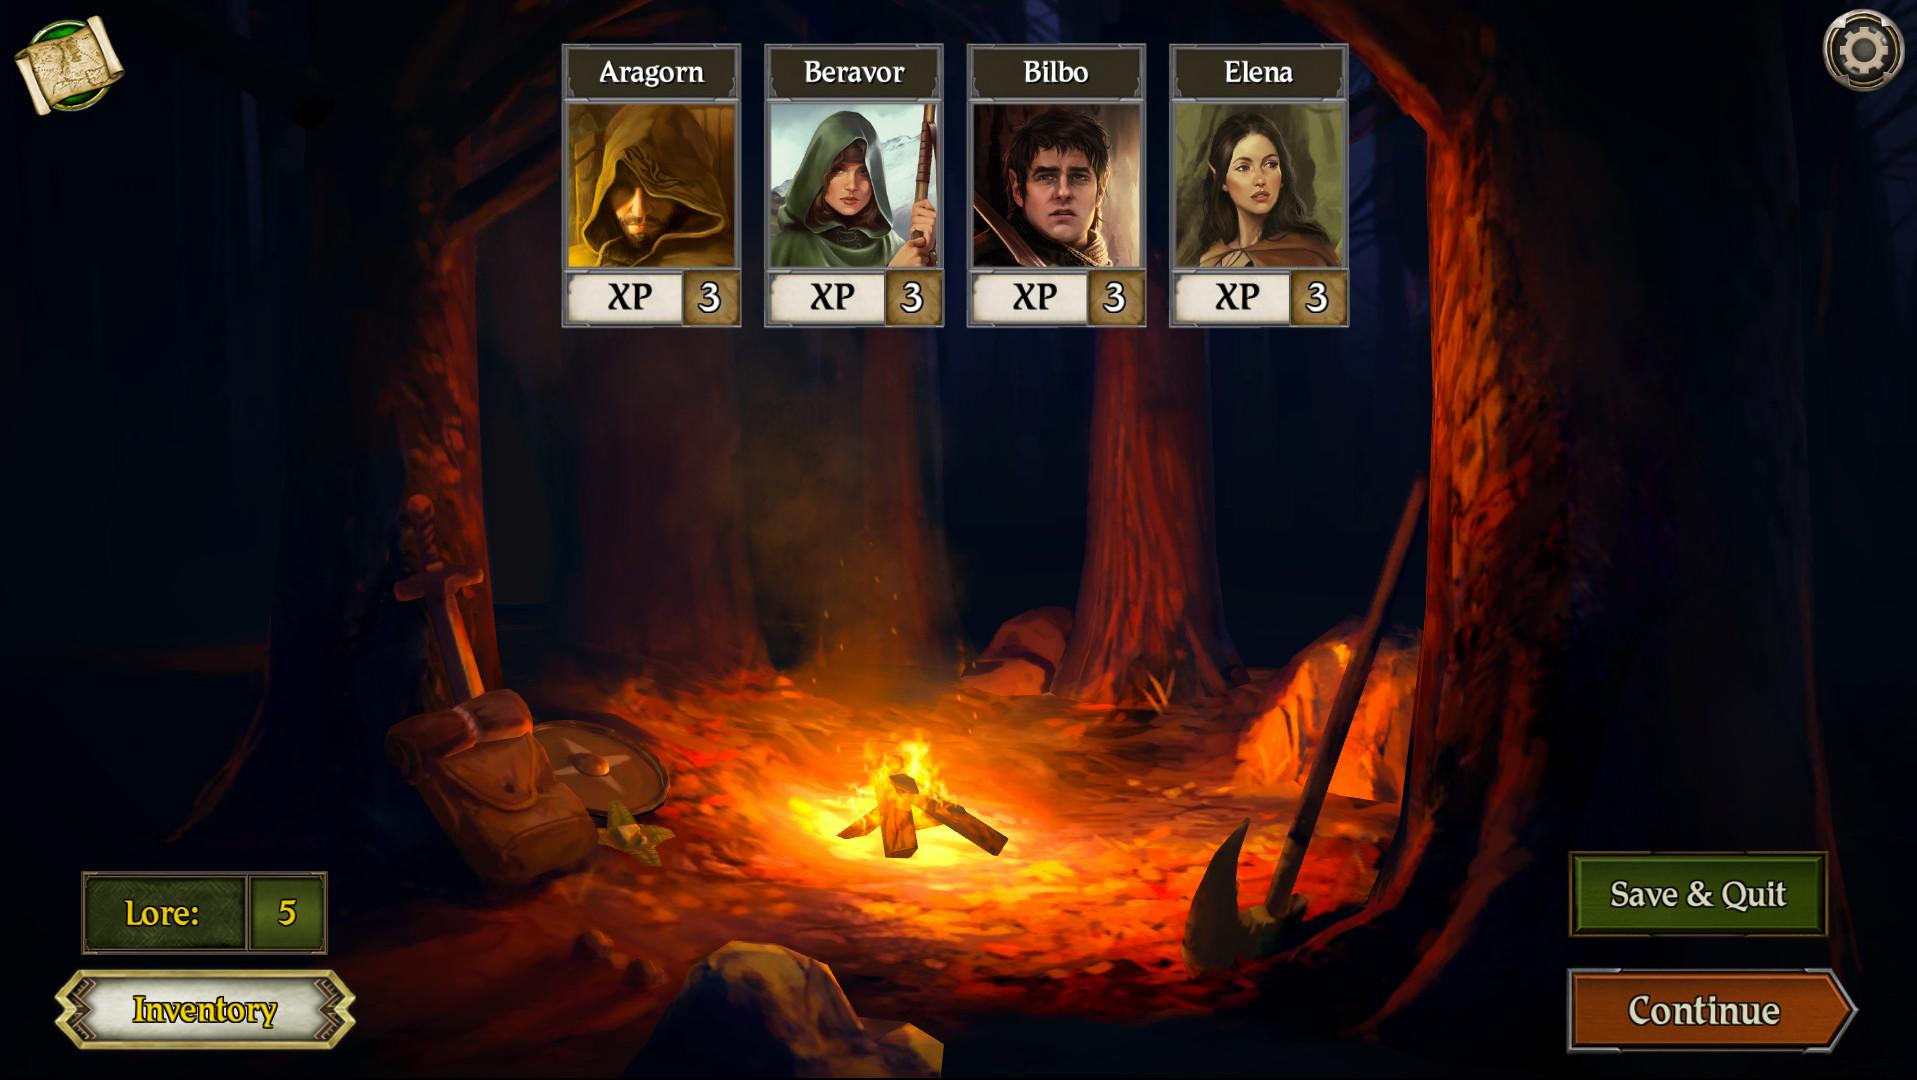 The Lord of the Rings: Journeys in Middle-earth Fiyat Karşılaştırma